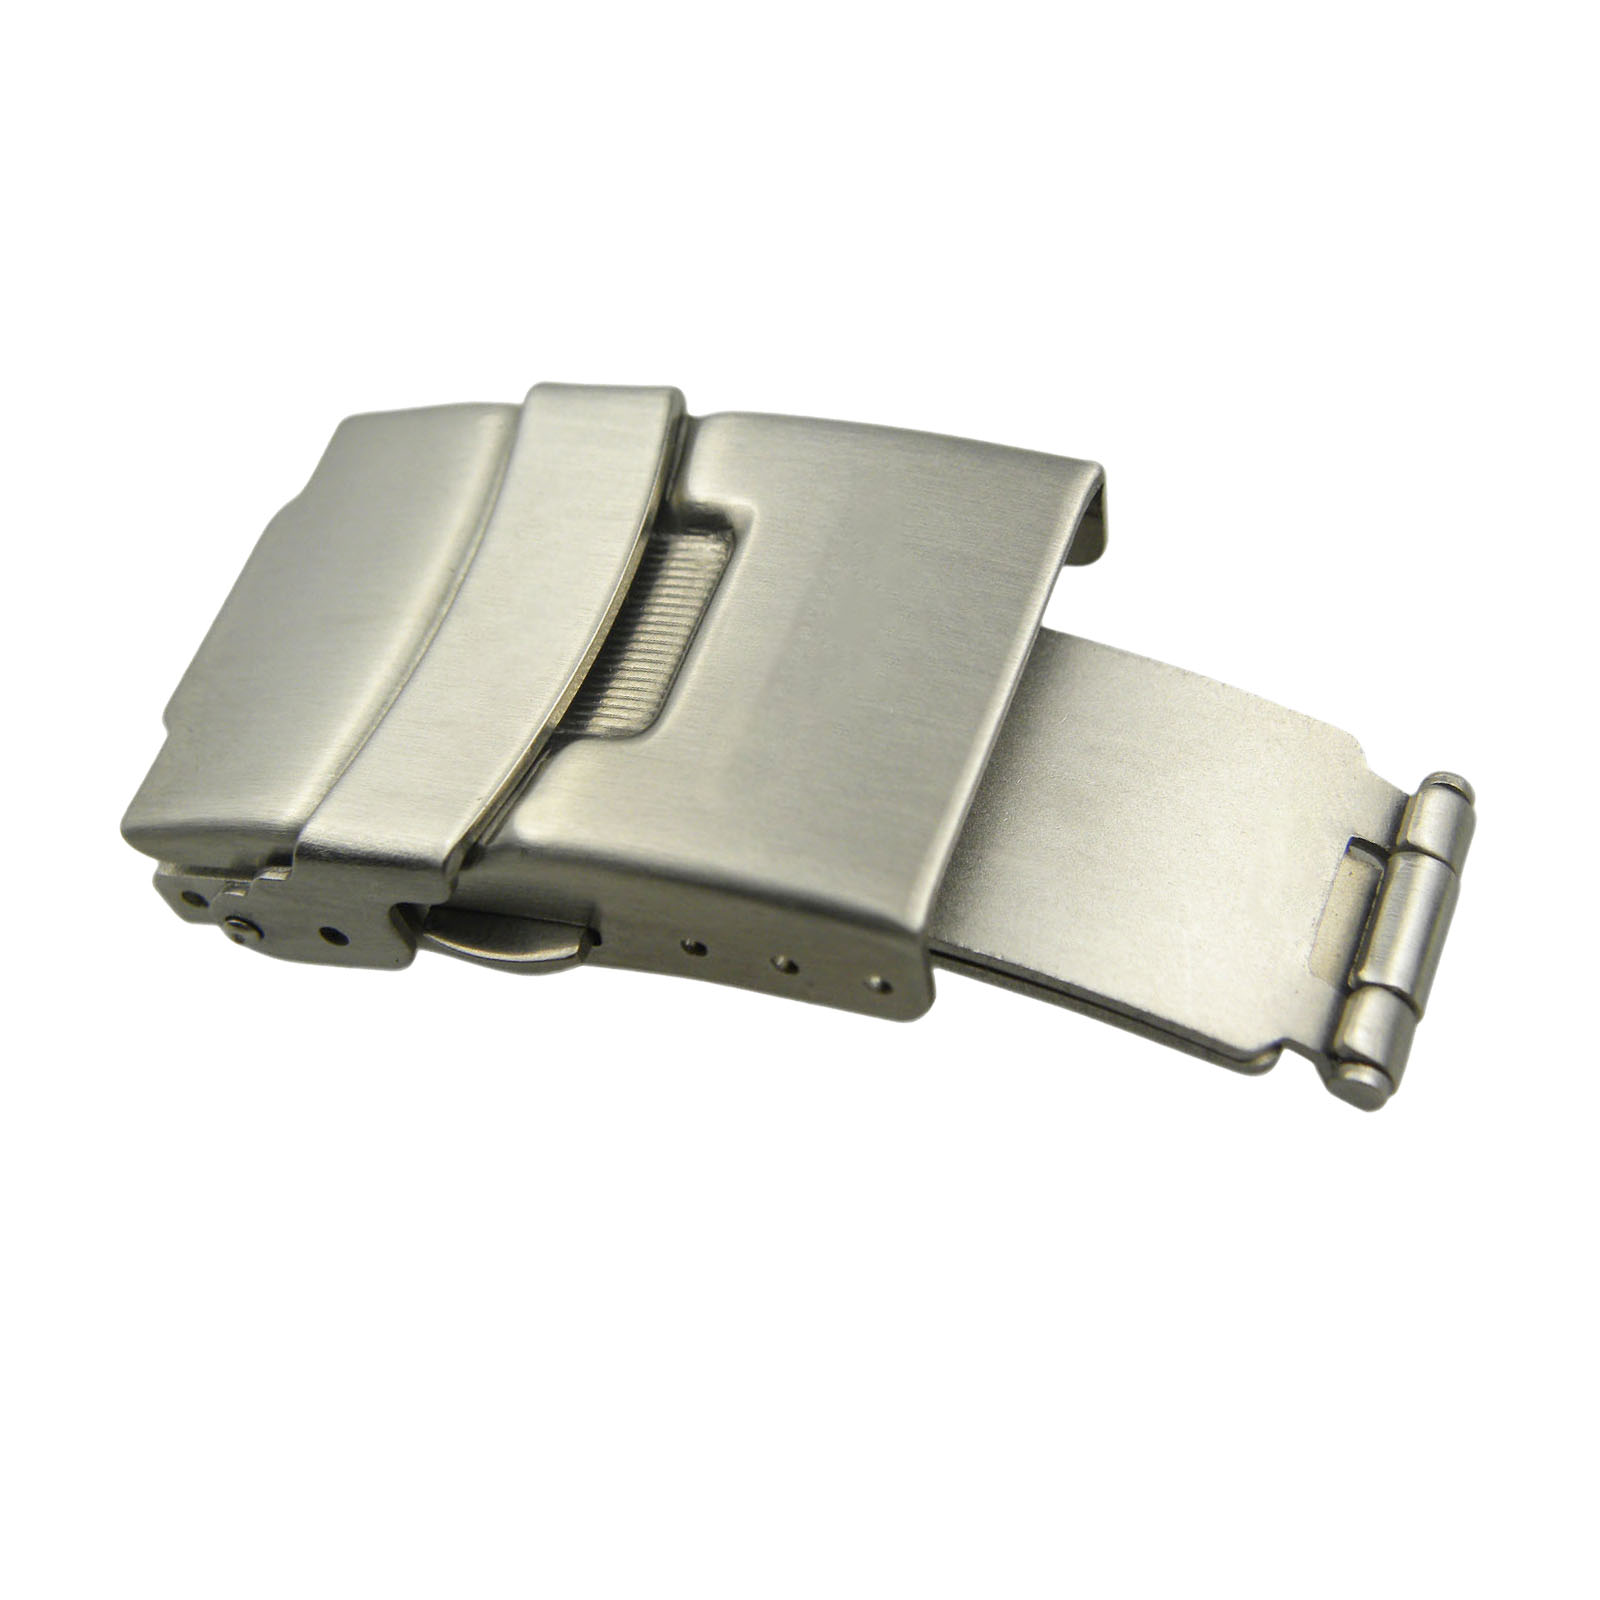 4x Heavy Duty Metal Replacement Roller Pin Buckle Shoe Strap Bag Belt Buckle